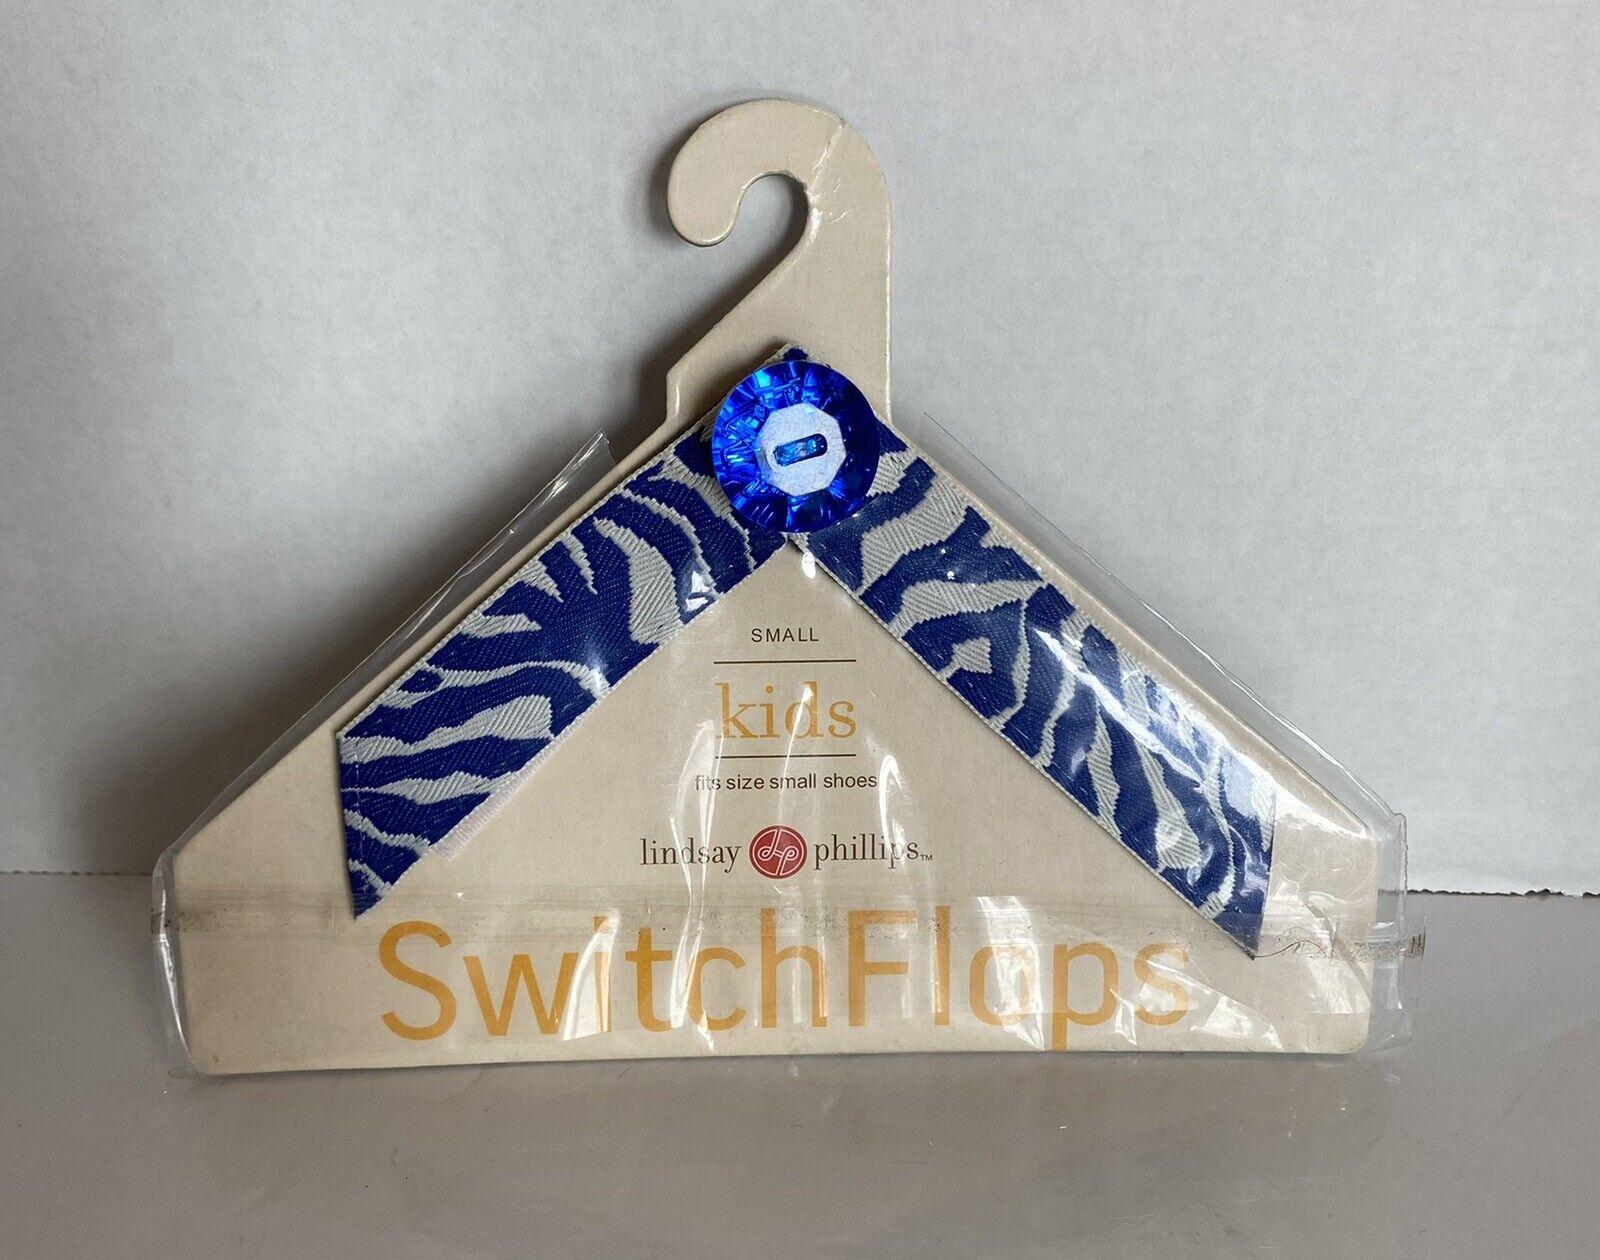 Lindsay Phillips Switchflops Straps for Kids